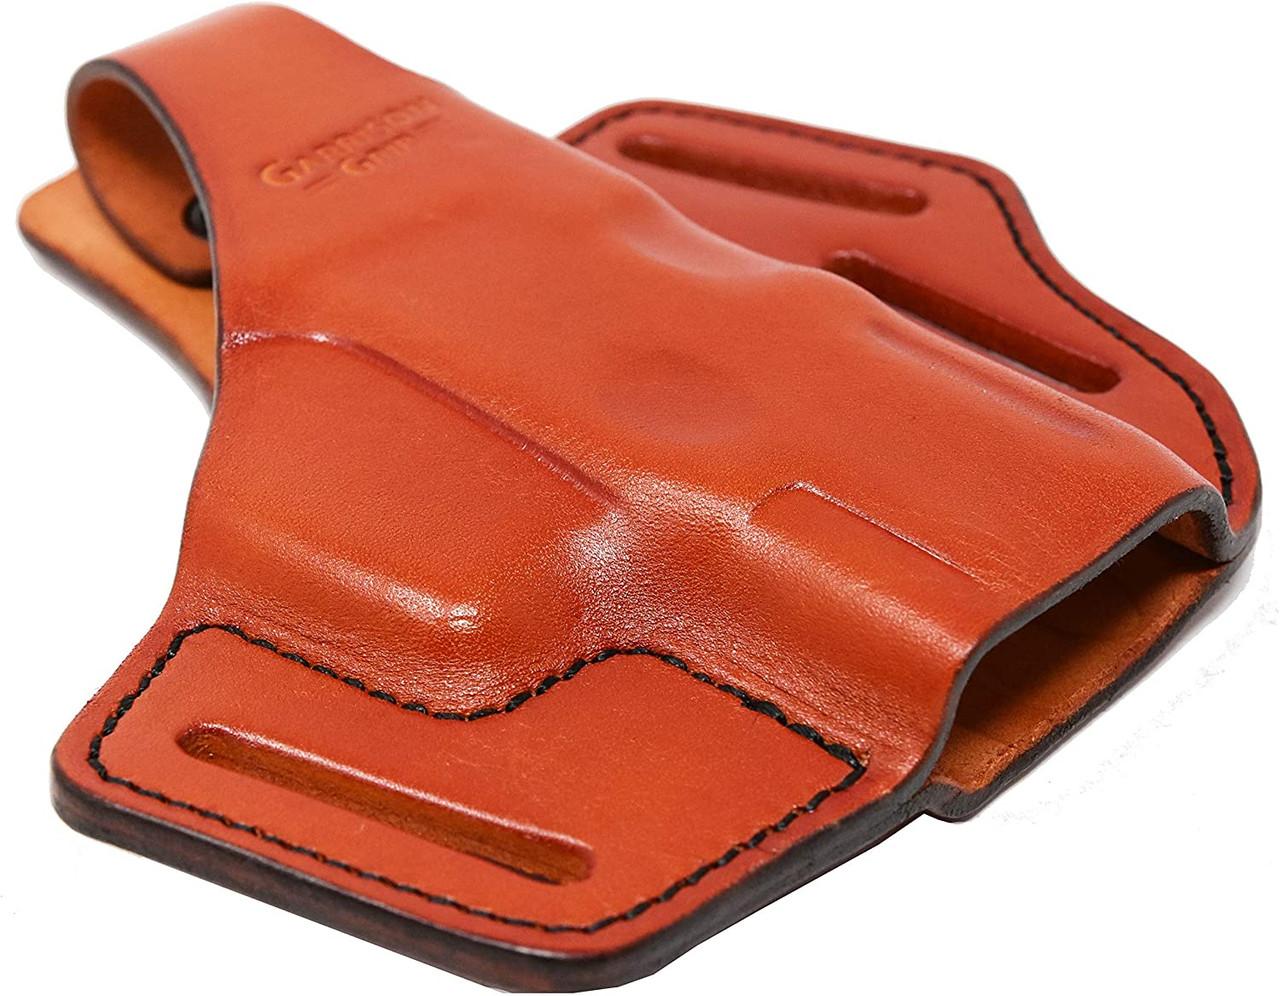 Garrison Grip Premium Full Grain Italian Leather 2 Position Tactical Holster Fits S&W M&P Shield 9 (Tan)